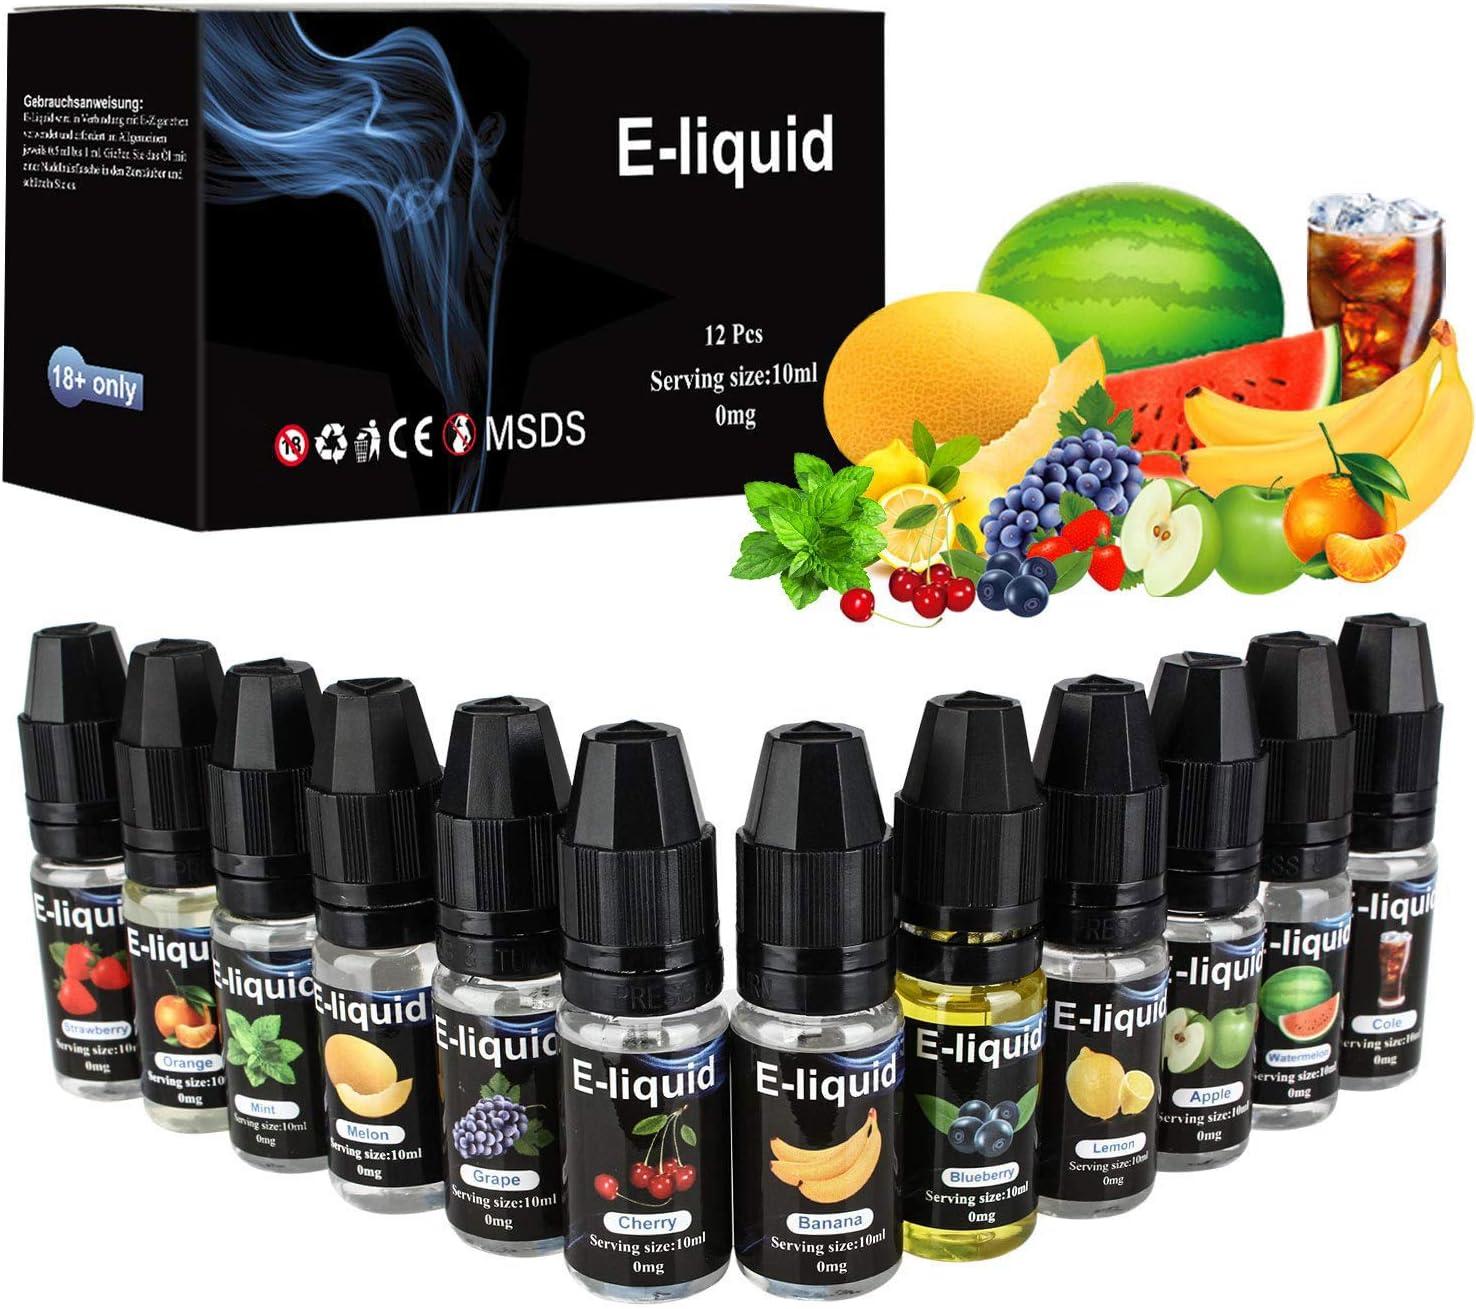 E Liquido, E Liquido Vaper Electronic Cigarette E-Liquido 50VG/50PG, E-Liquid sin Nicotina 12x10ml, E Liquid set para Cigarrillos Electronicos Fruta